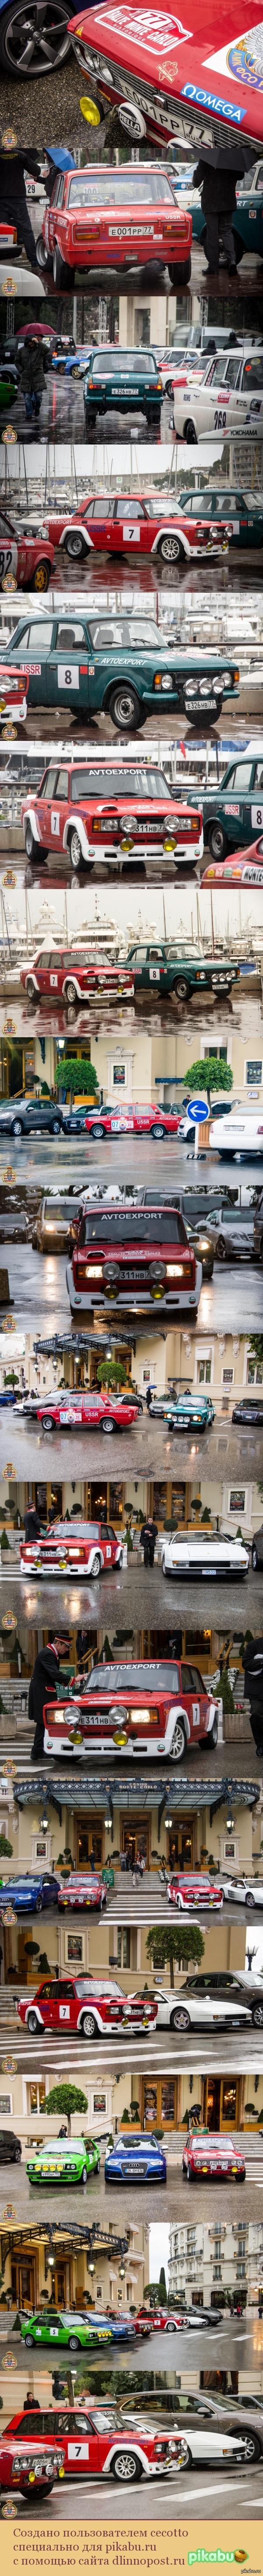 Rallye Monte-Carlo Historique 2014 автомобили СССР на Rallye Monte-Carlo Historique 2014